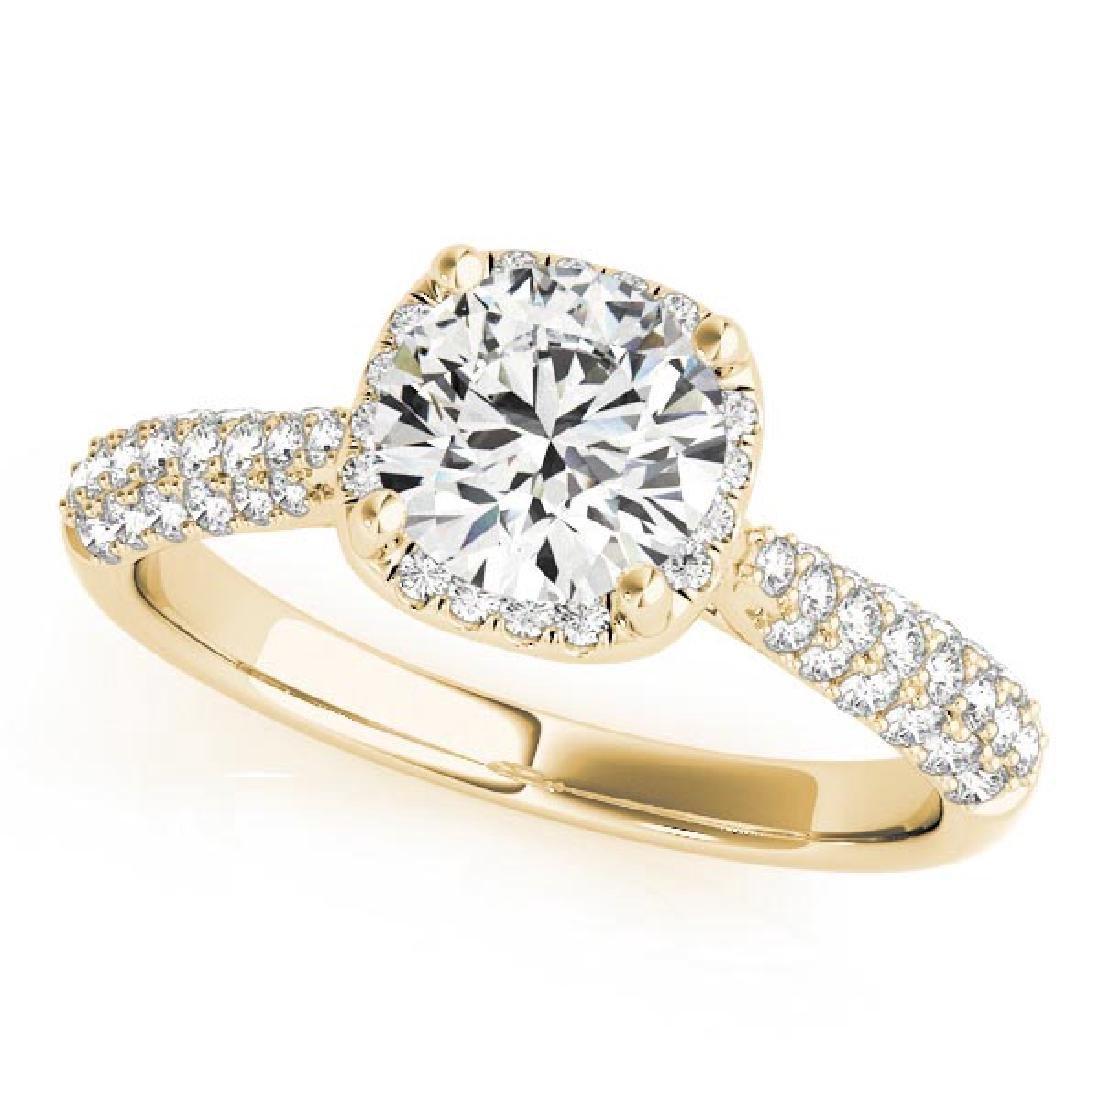 CERTIFIED 18K YELLOW GOLD 1.15 CT G-H/VS-SI1 DIAMOND HA